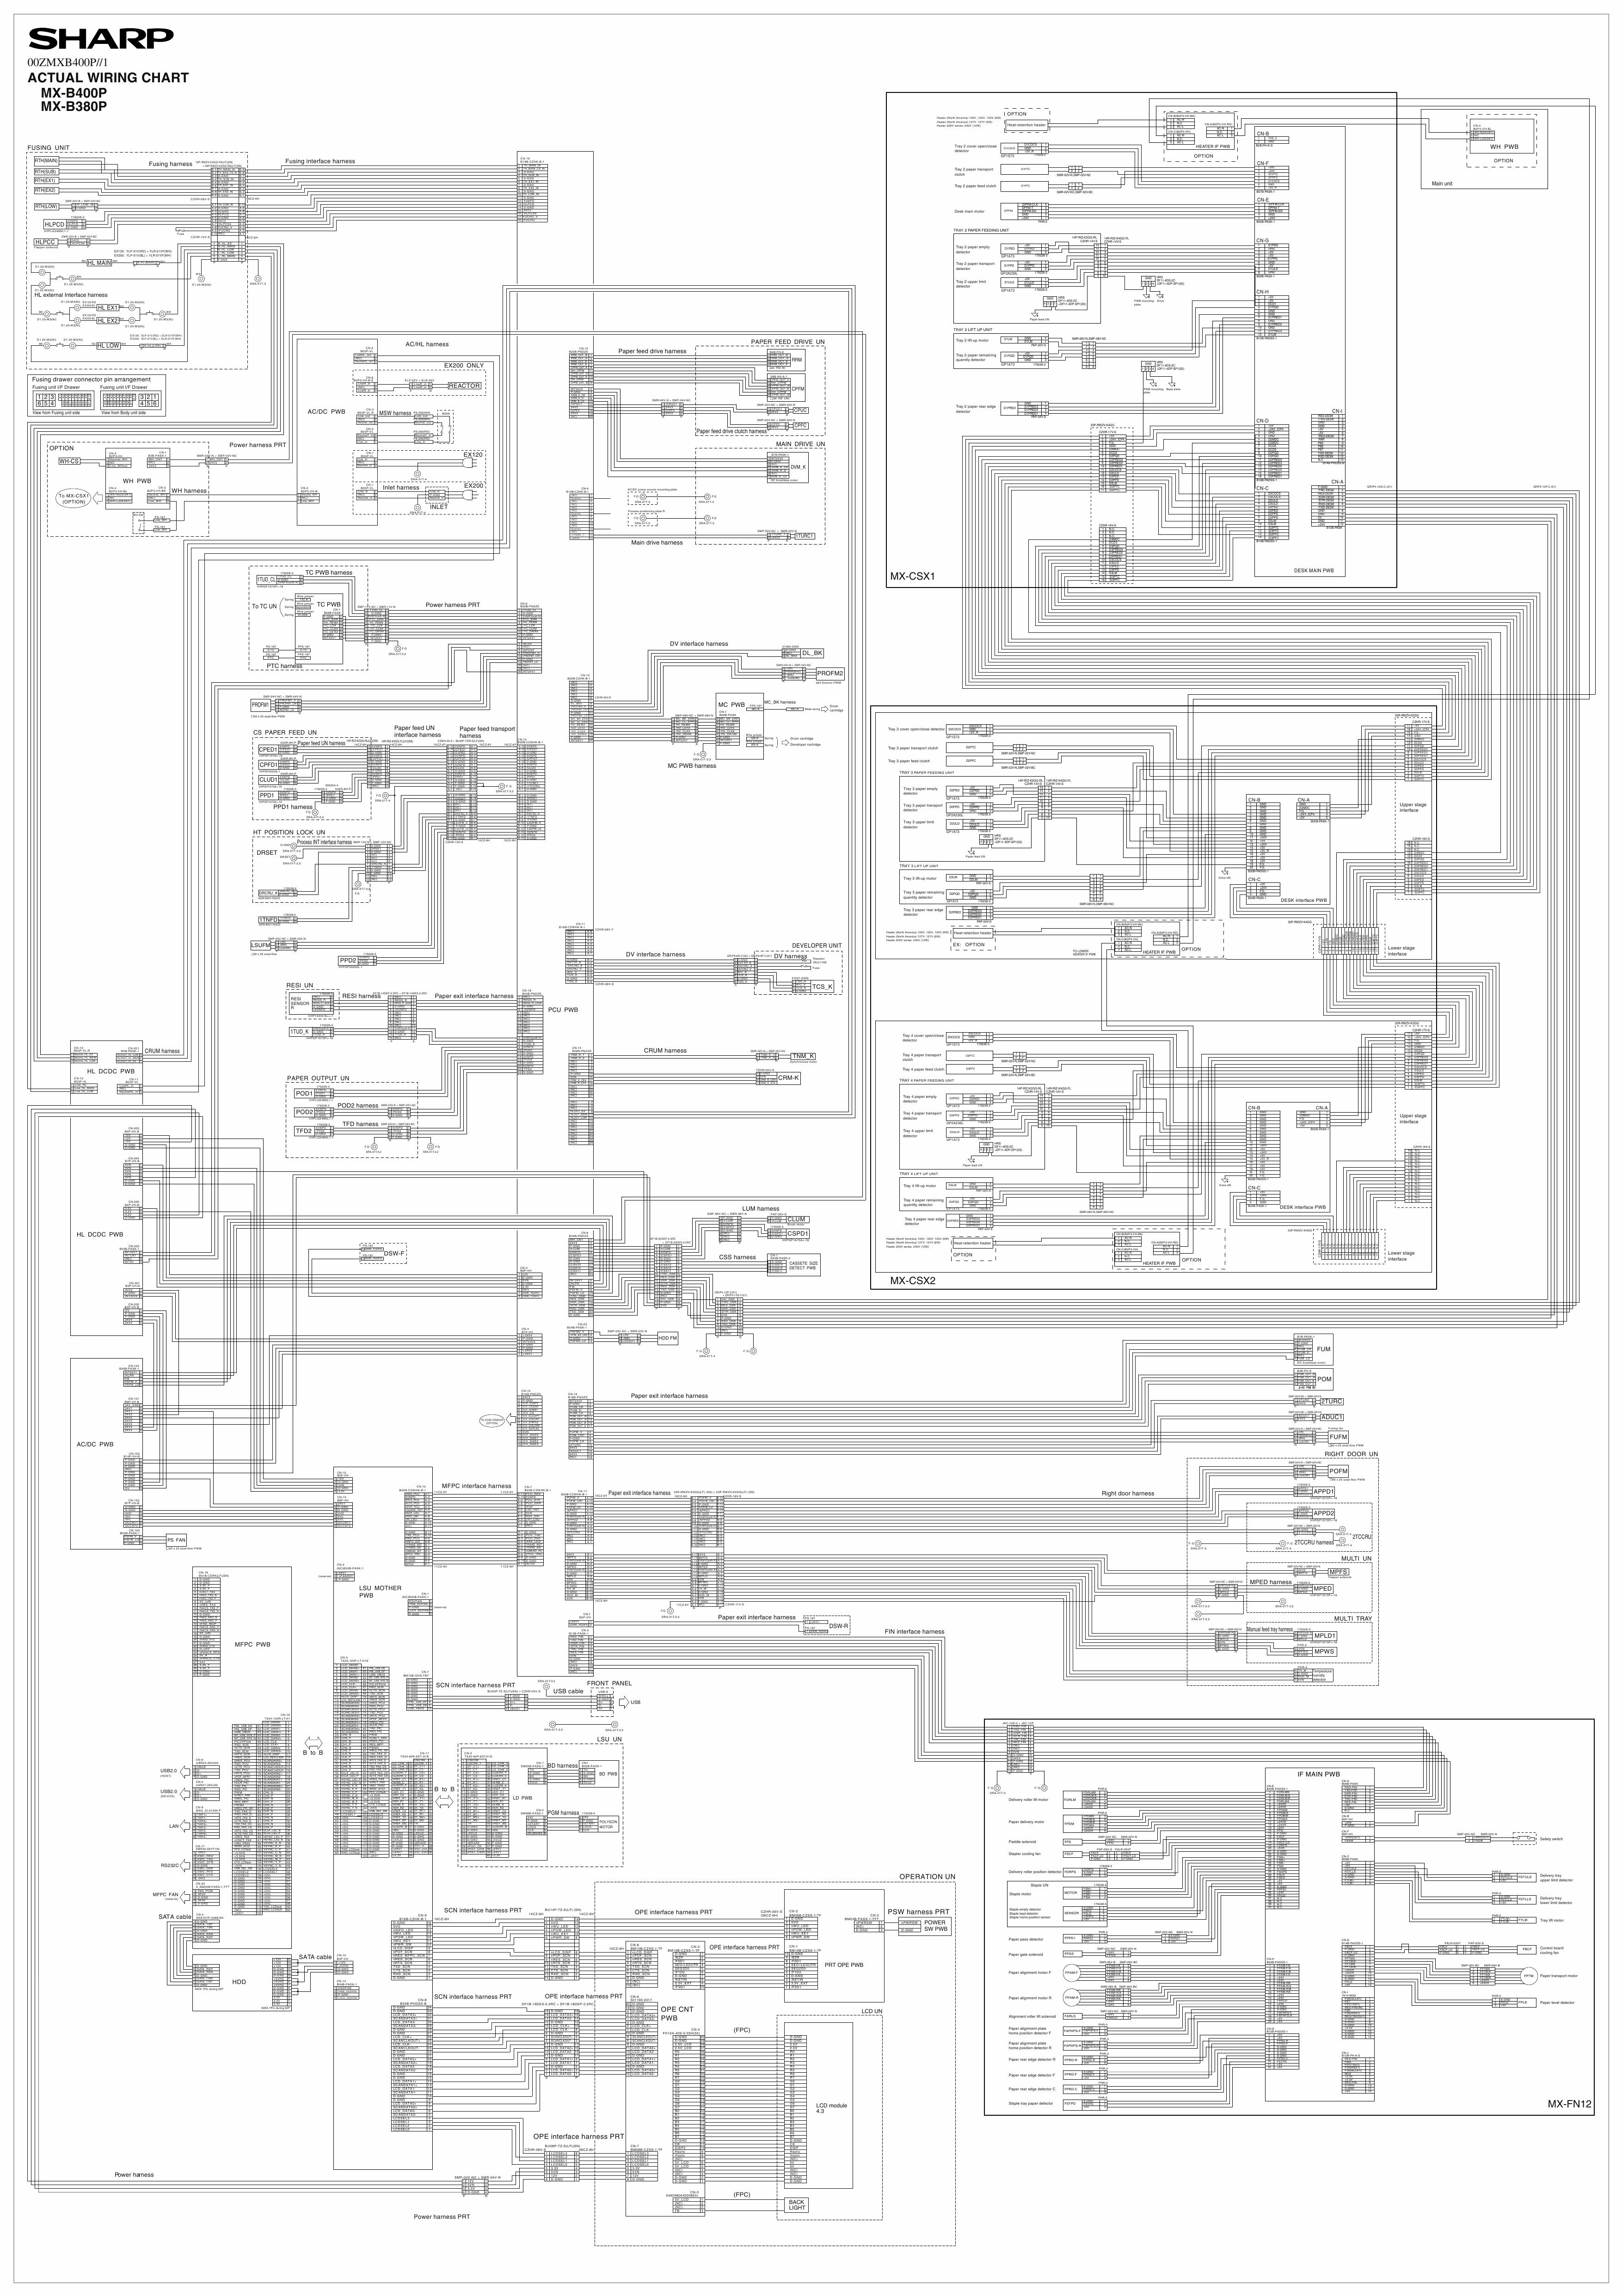 Financial Comparison Chart Wiring Diagram